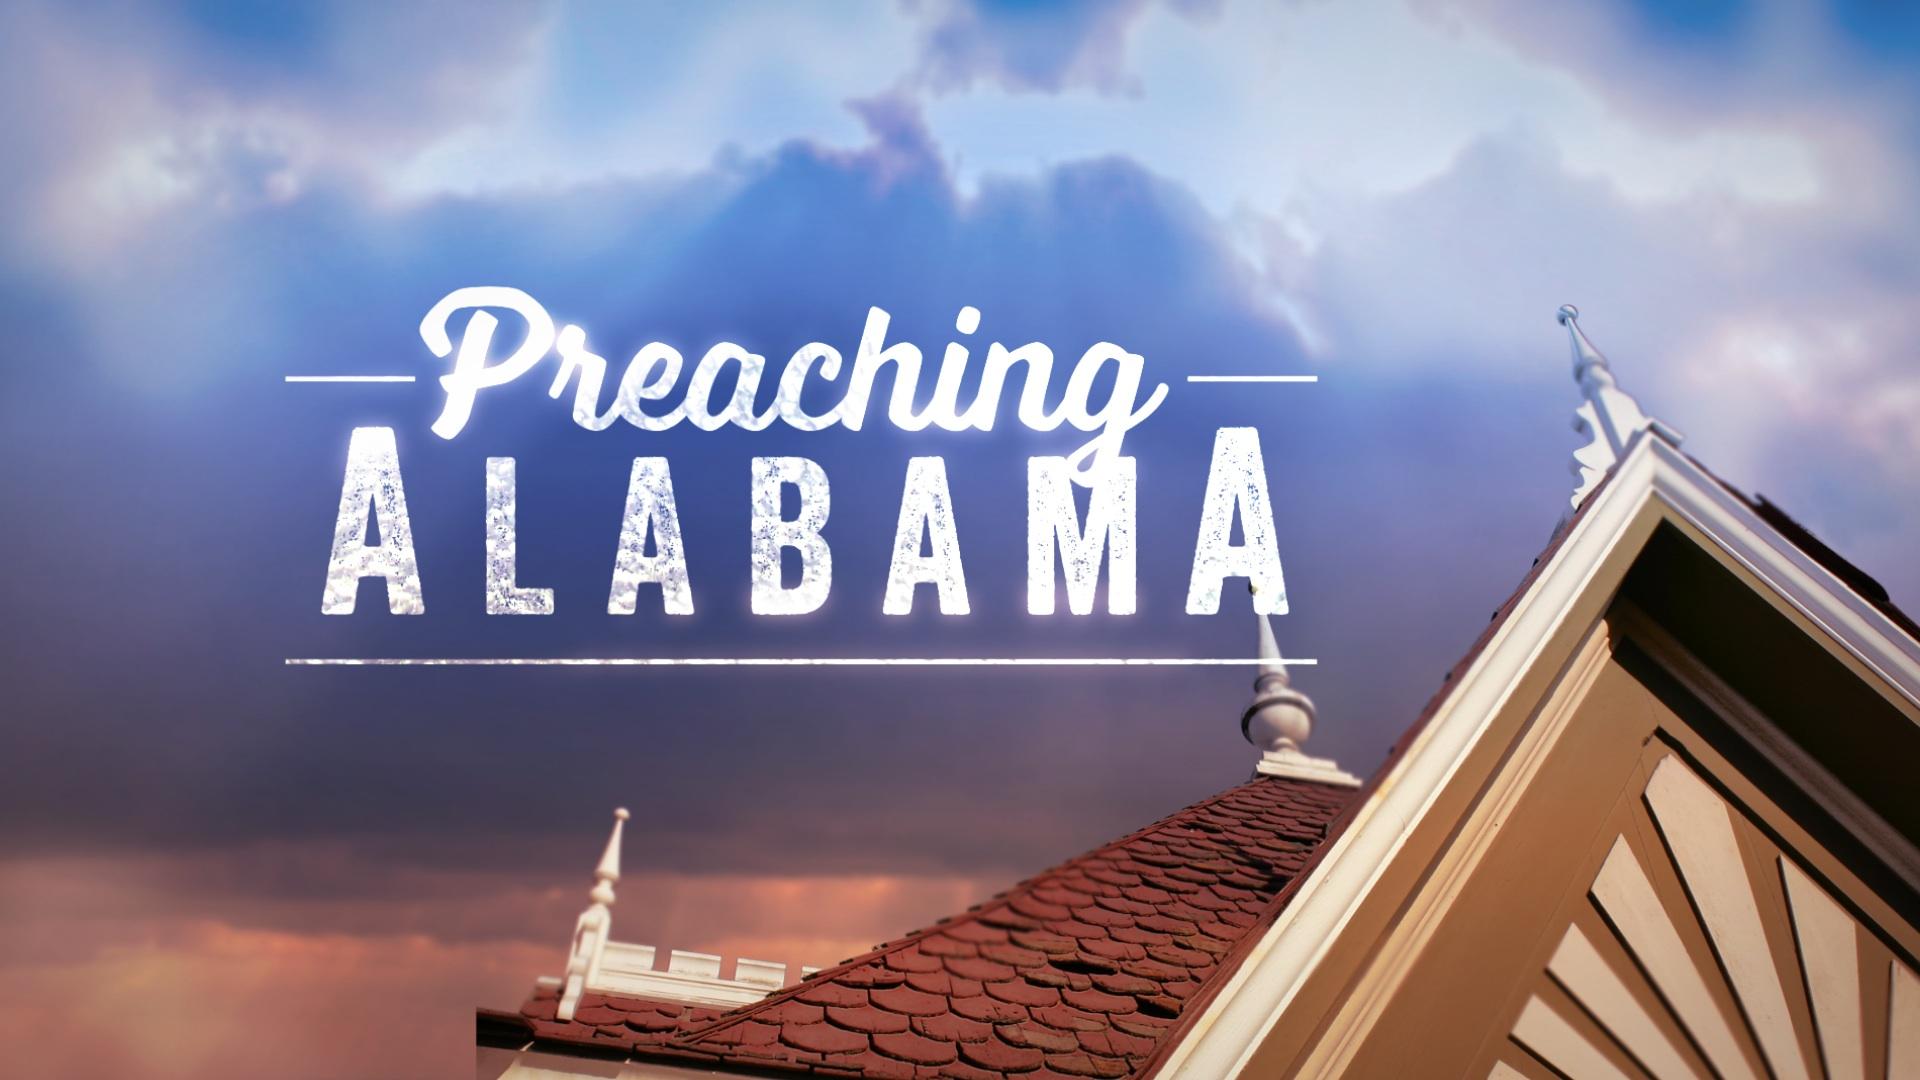 PREACHING ALABAMA - TLC | RYAN SEACREST PRODUCTIONS